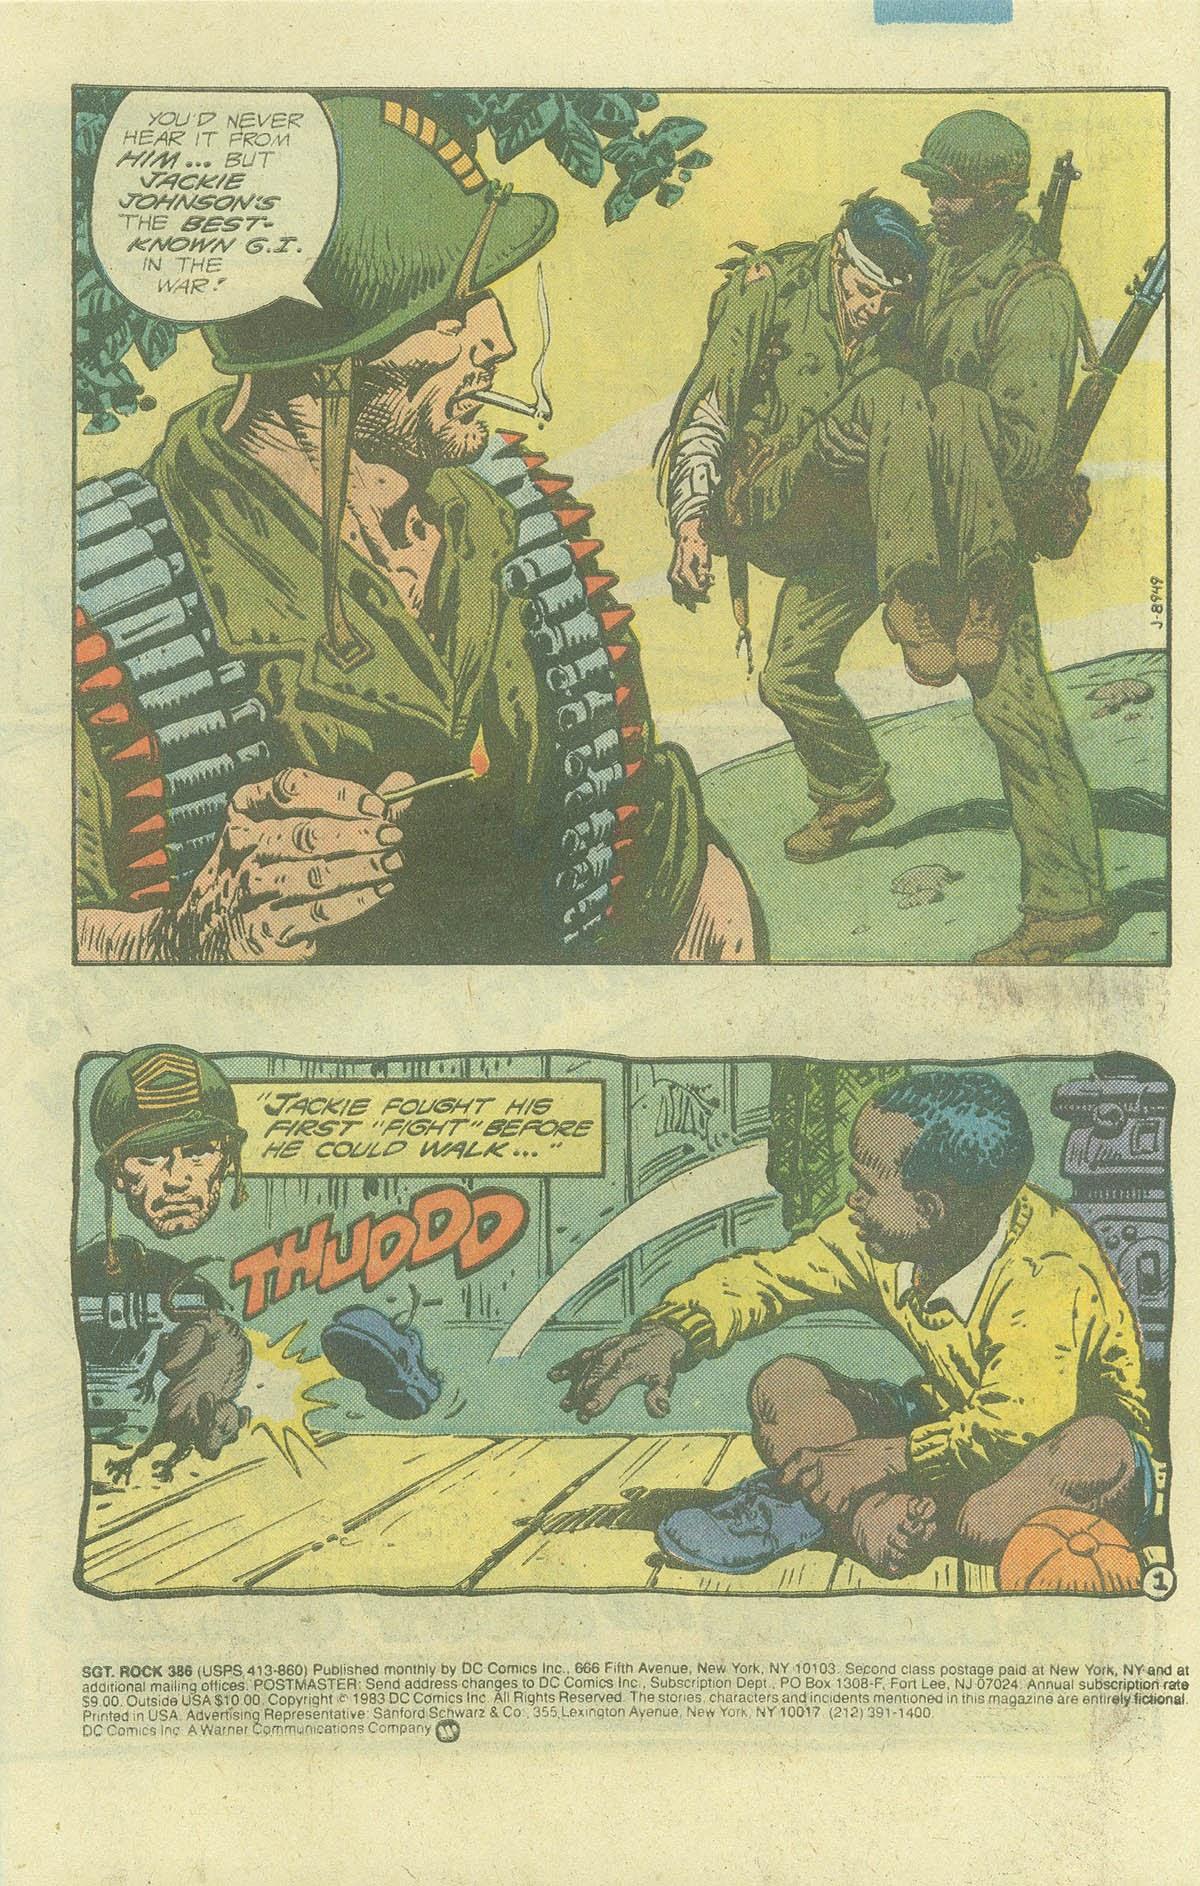 Read online Sgt. Rock comic -  Issue #386 - 2